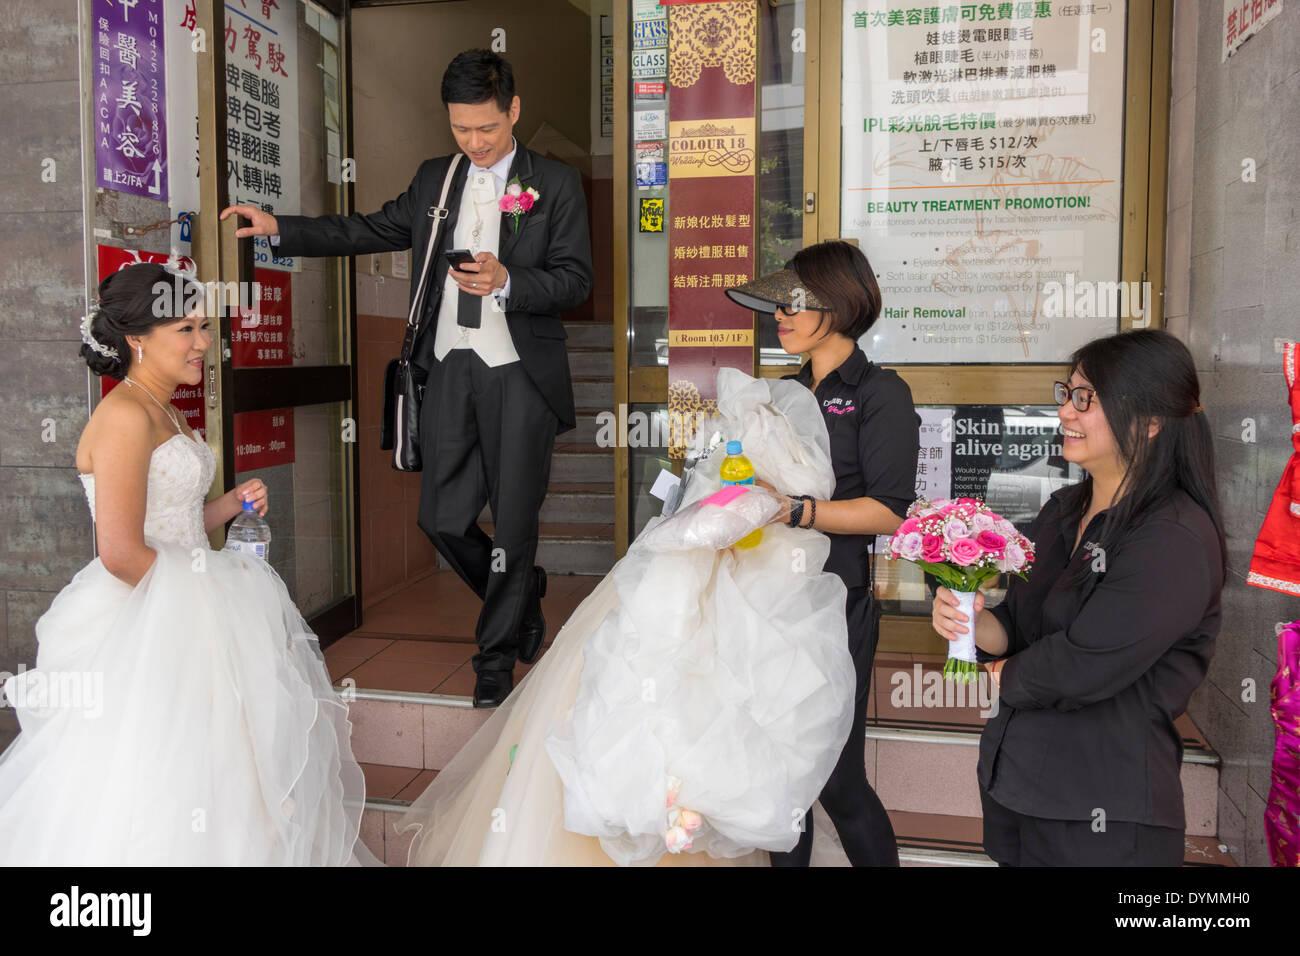 Sydney Australia NSW New South Wales Haymarket Chinatown Asian Woman Man Bride Groom Wedding Dress White